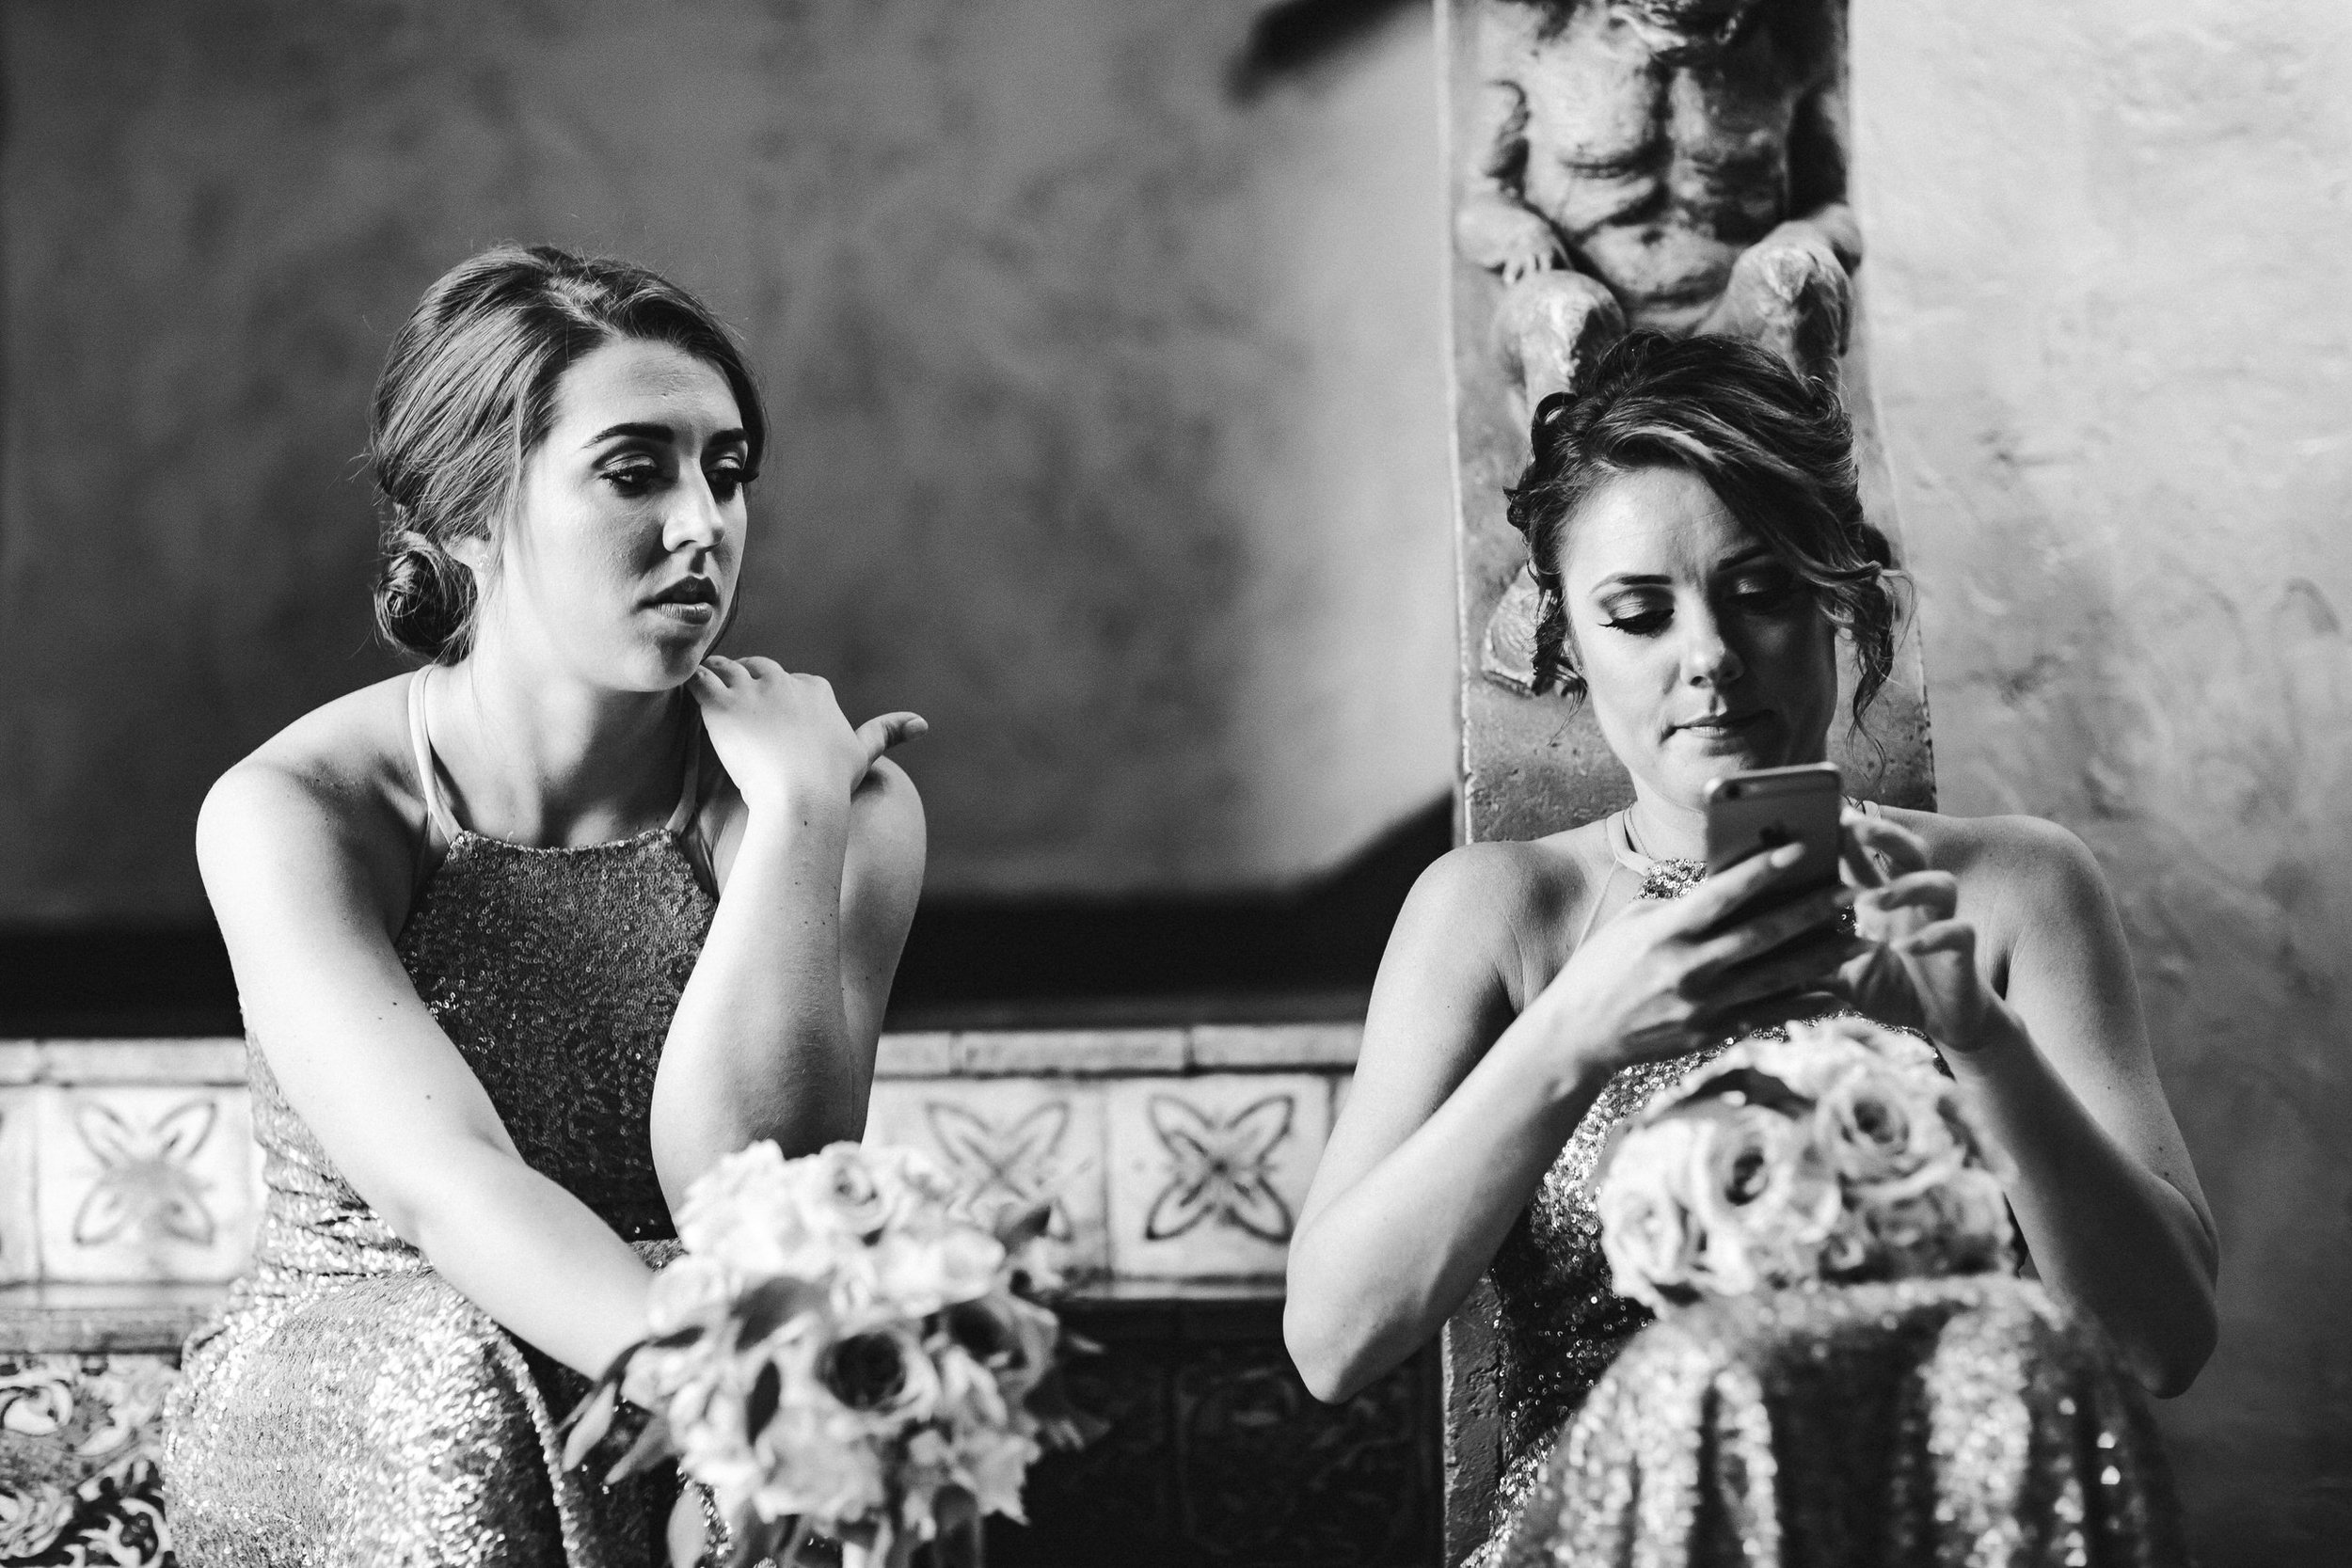 biltmore-wedding-steph-lynn-photo-photographer-bride-and-groom-21.jpg